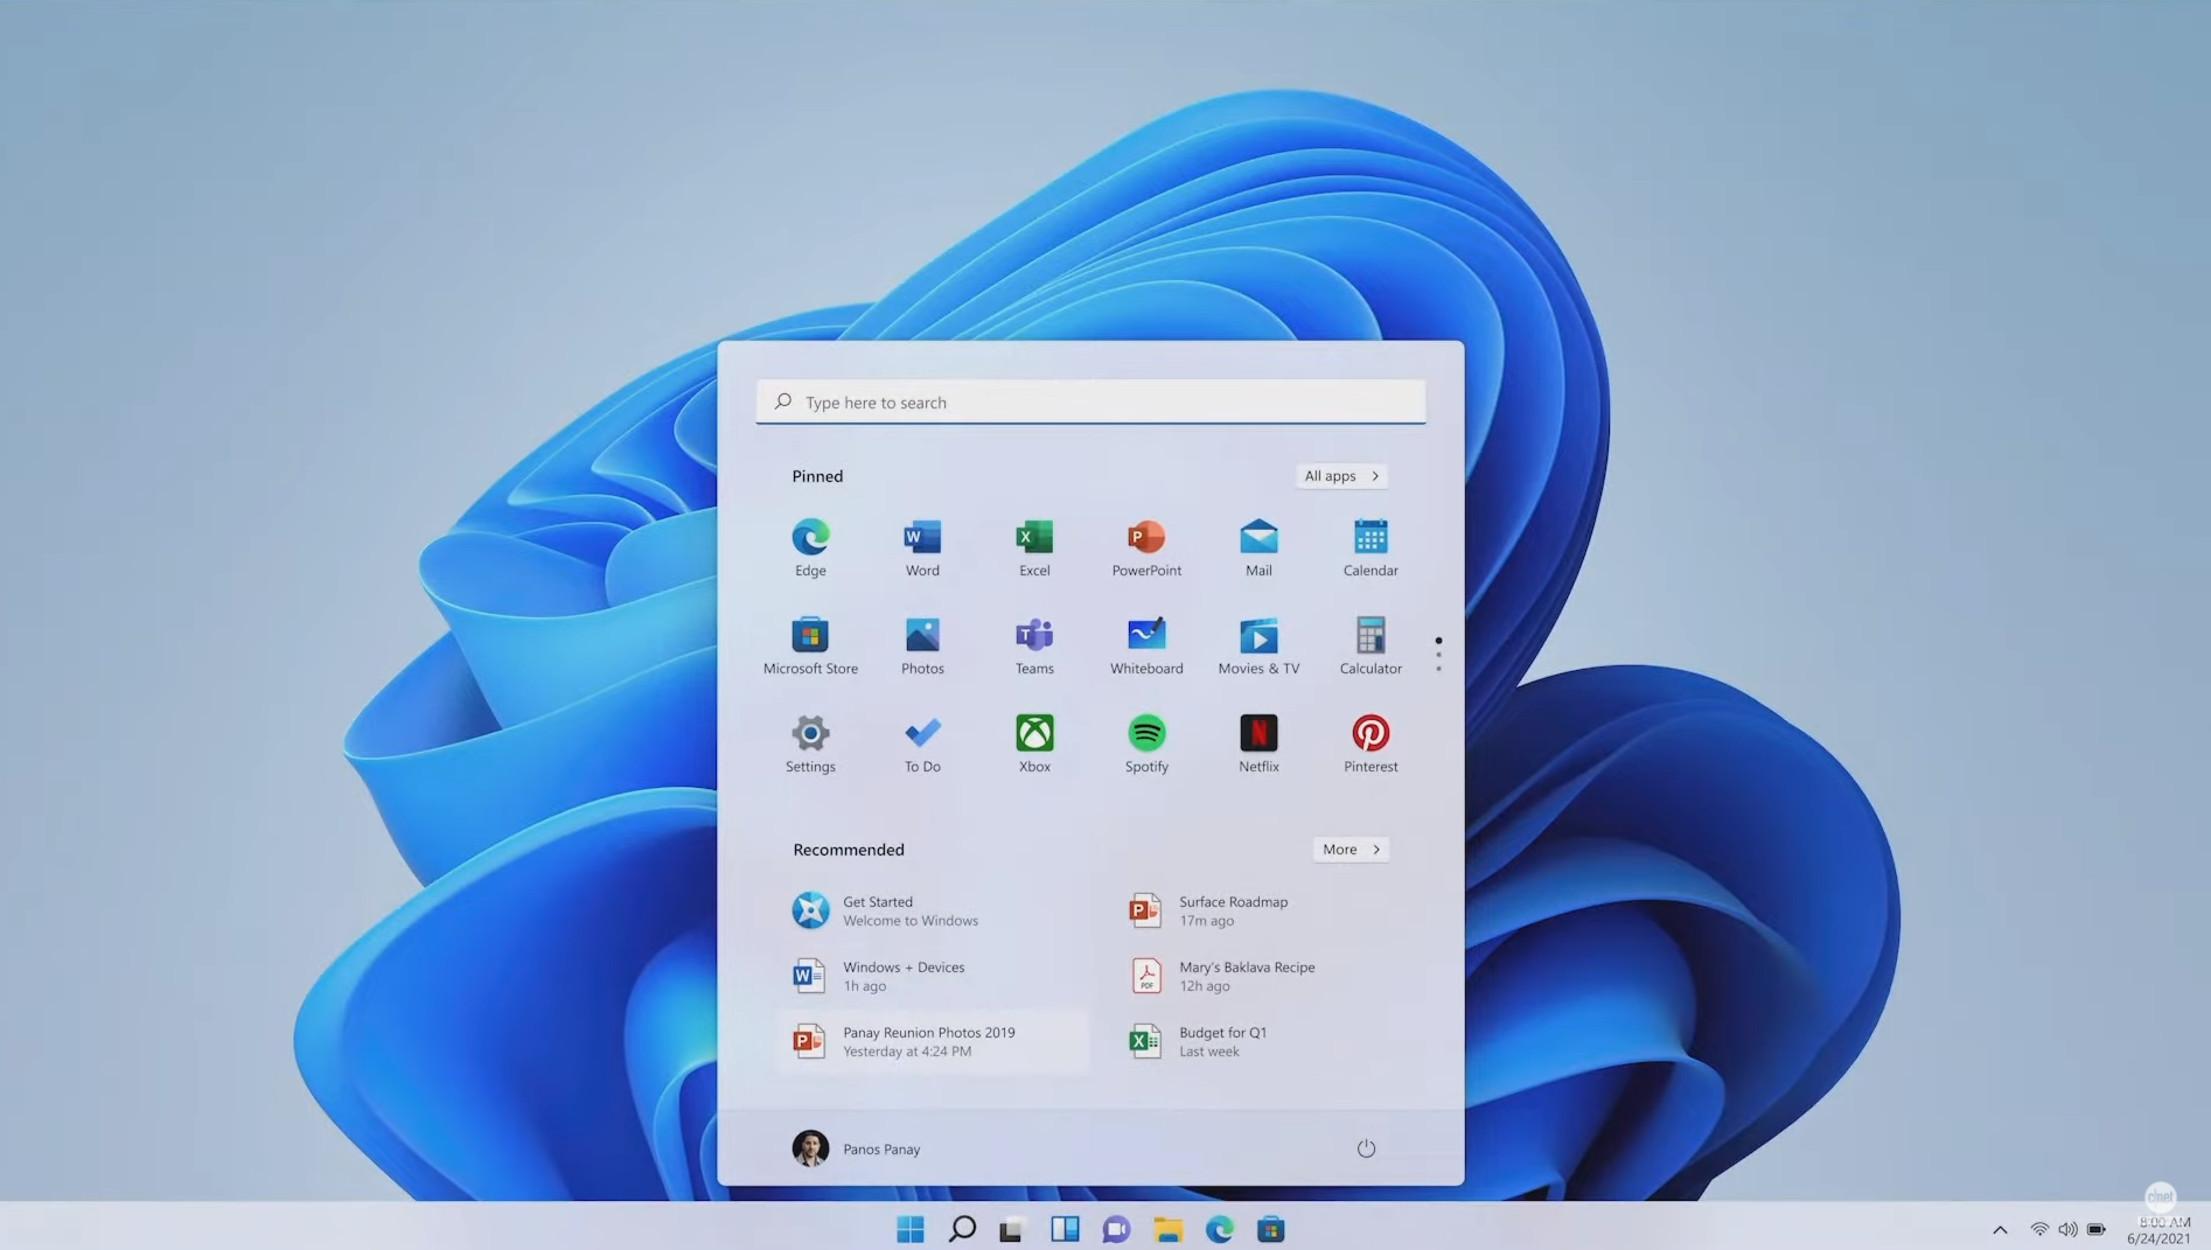 Windows 11: Διαθέσιμα από σήμερα από την Microsoft ως δωρεάν αναβάθμιση